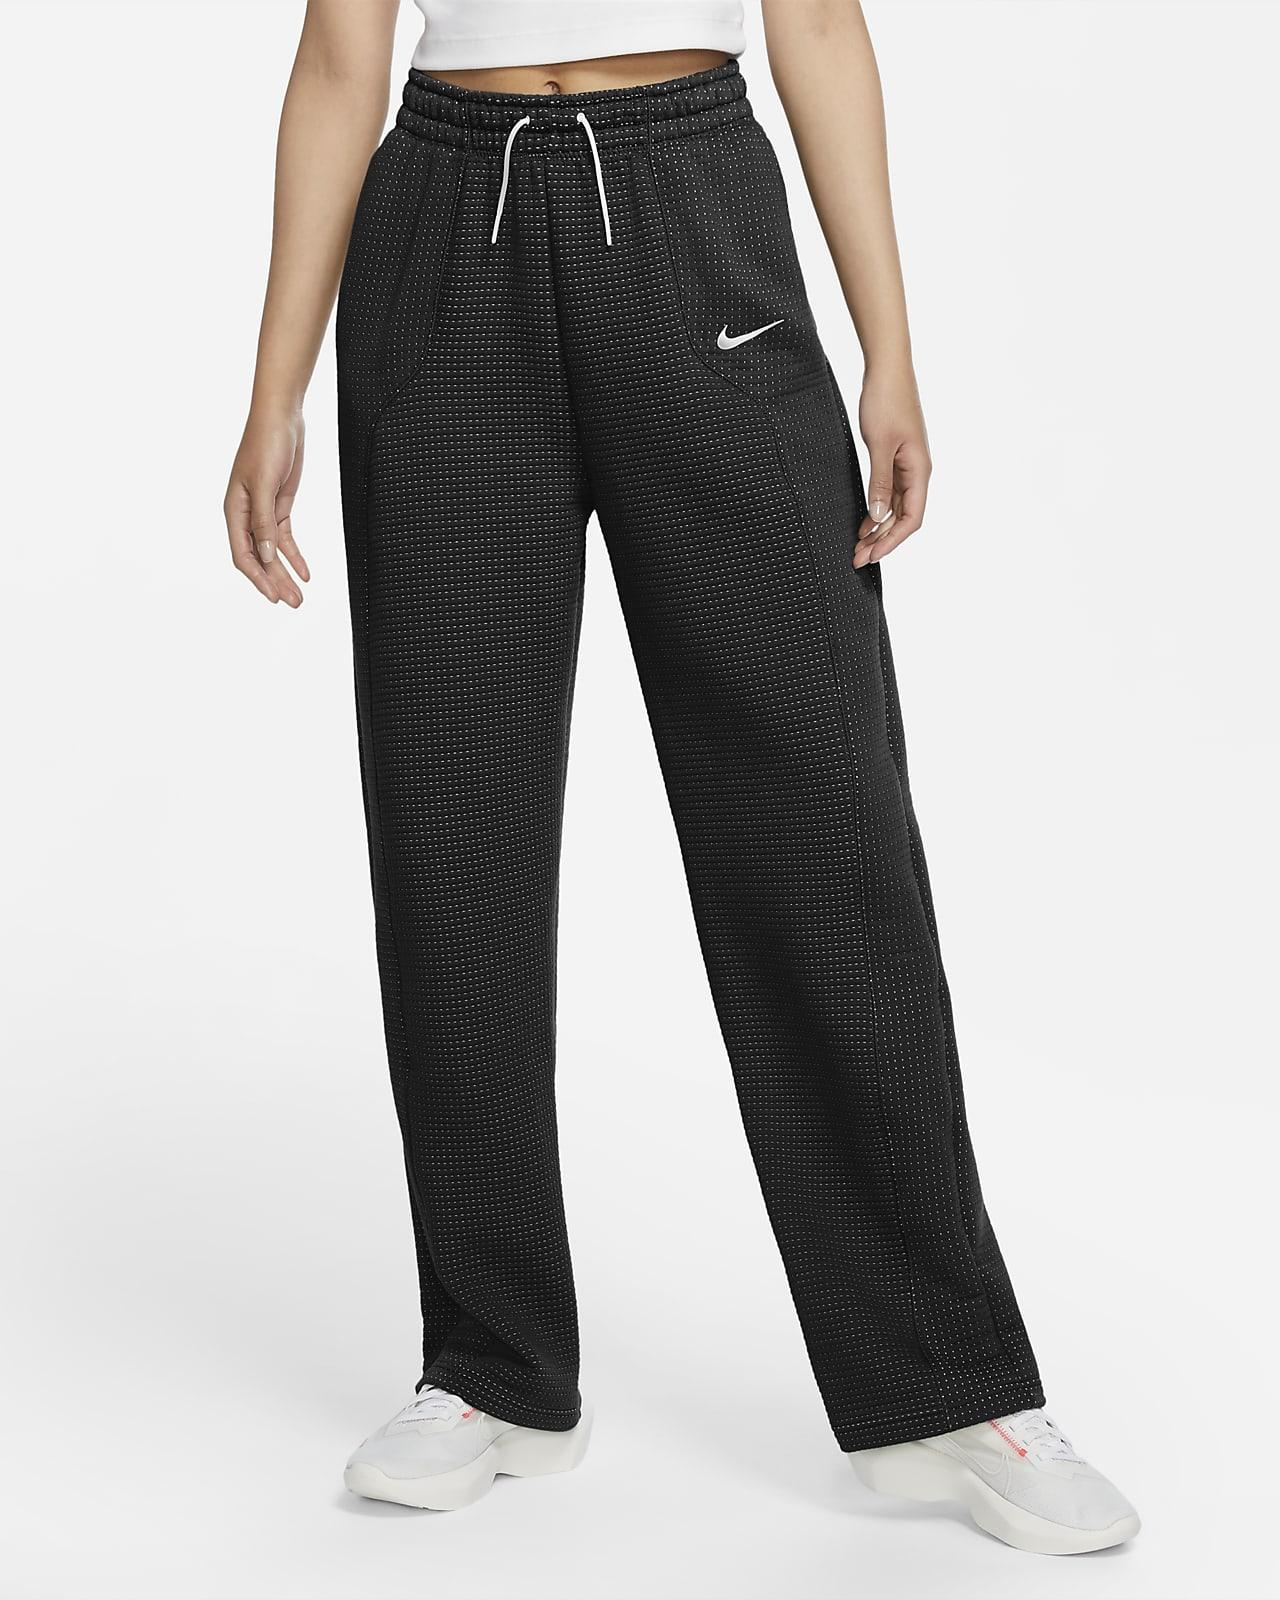 Nike Sportswear Tech Fleece Engineered damesbroek met jacquardpatroon